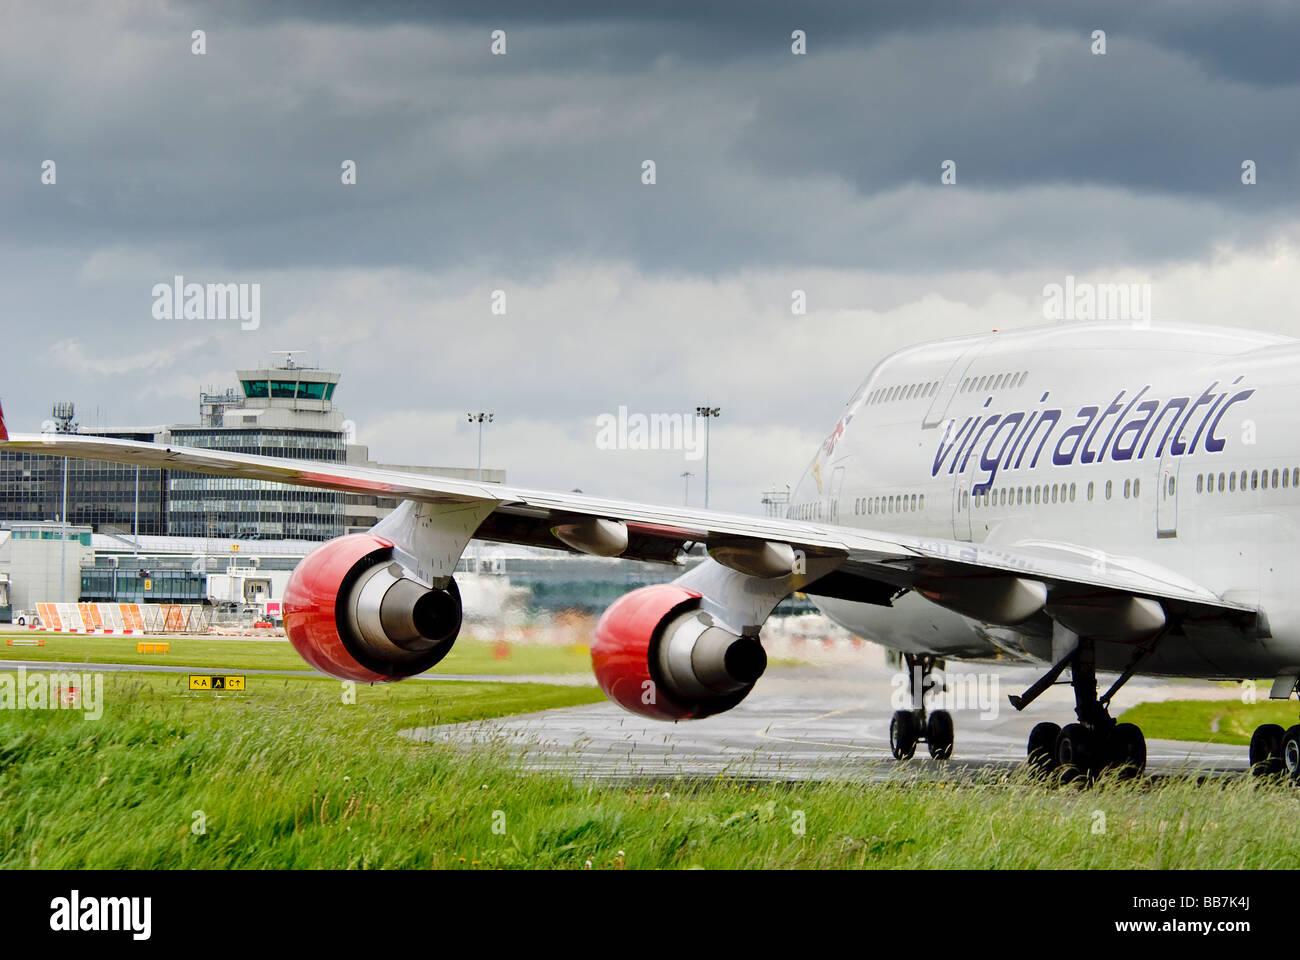 A Virgin Atlantic Jumbojet Boeing 747 taxiing at Manchester International airport towards the main terminal and - Stock Image